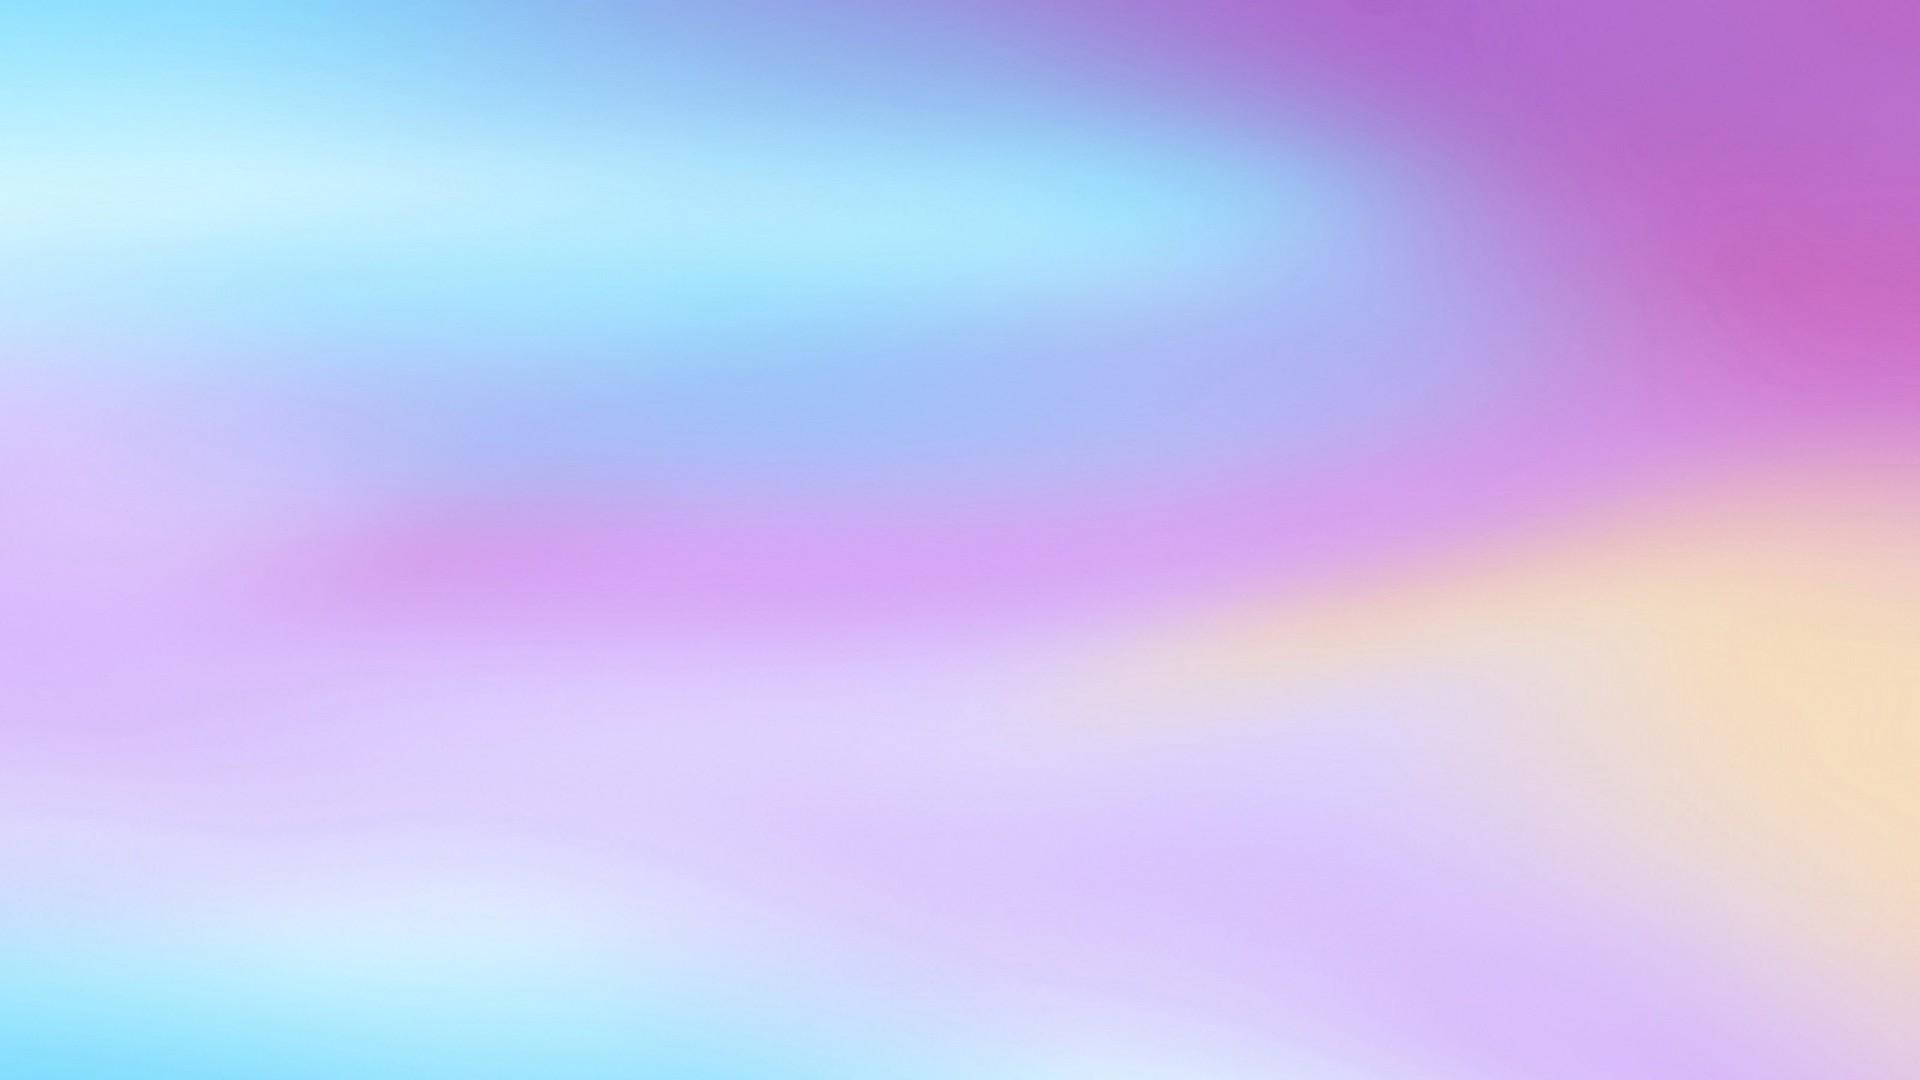 Pastel Color Wallpaper image hd